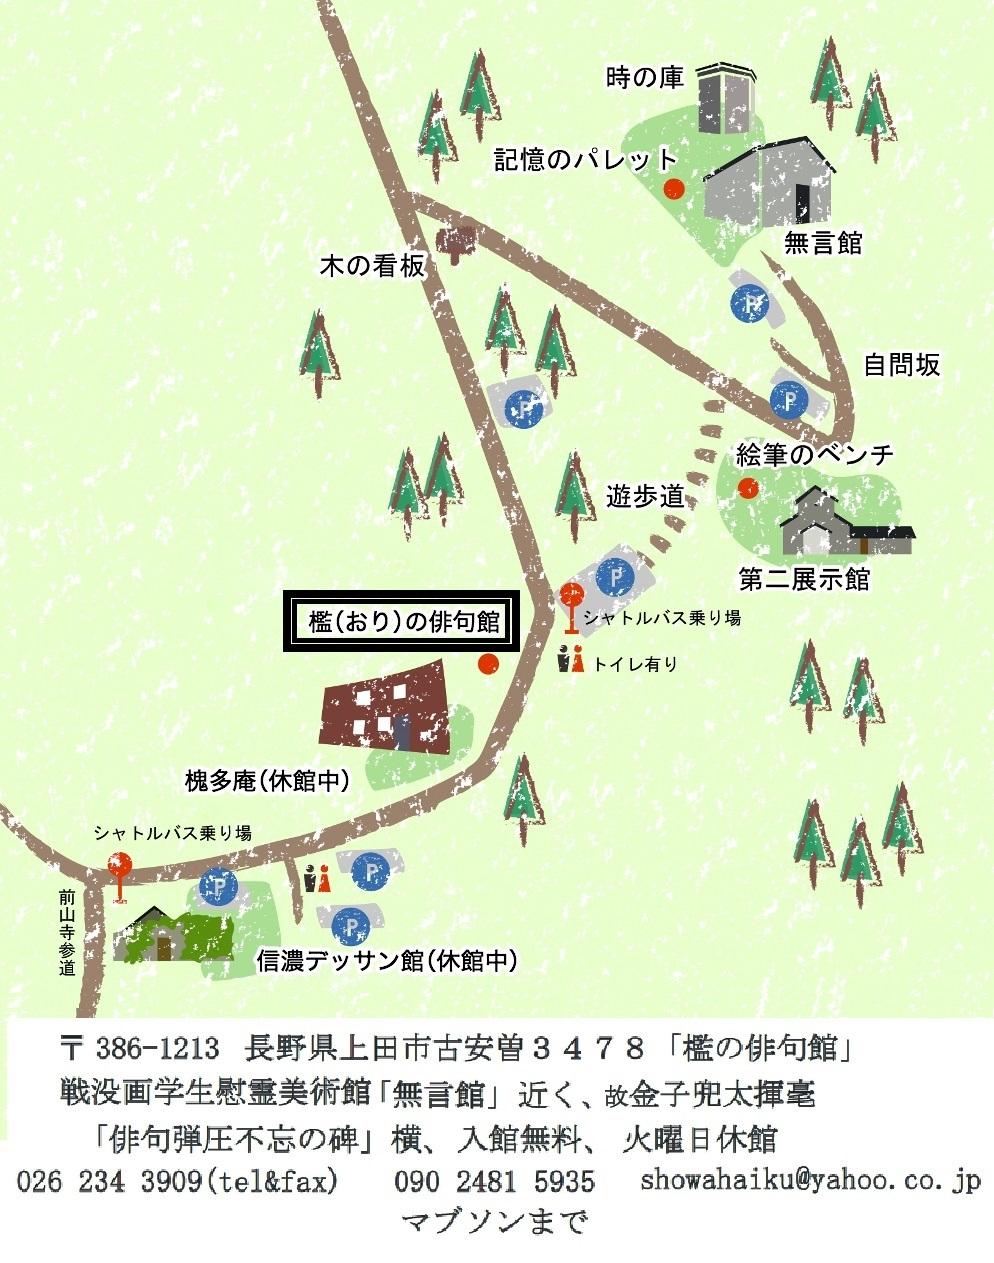 「檻の会」11月例会の報告 Kukai de novembre au memorial Ori no haikukan_e0375210_22152949.jpg